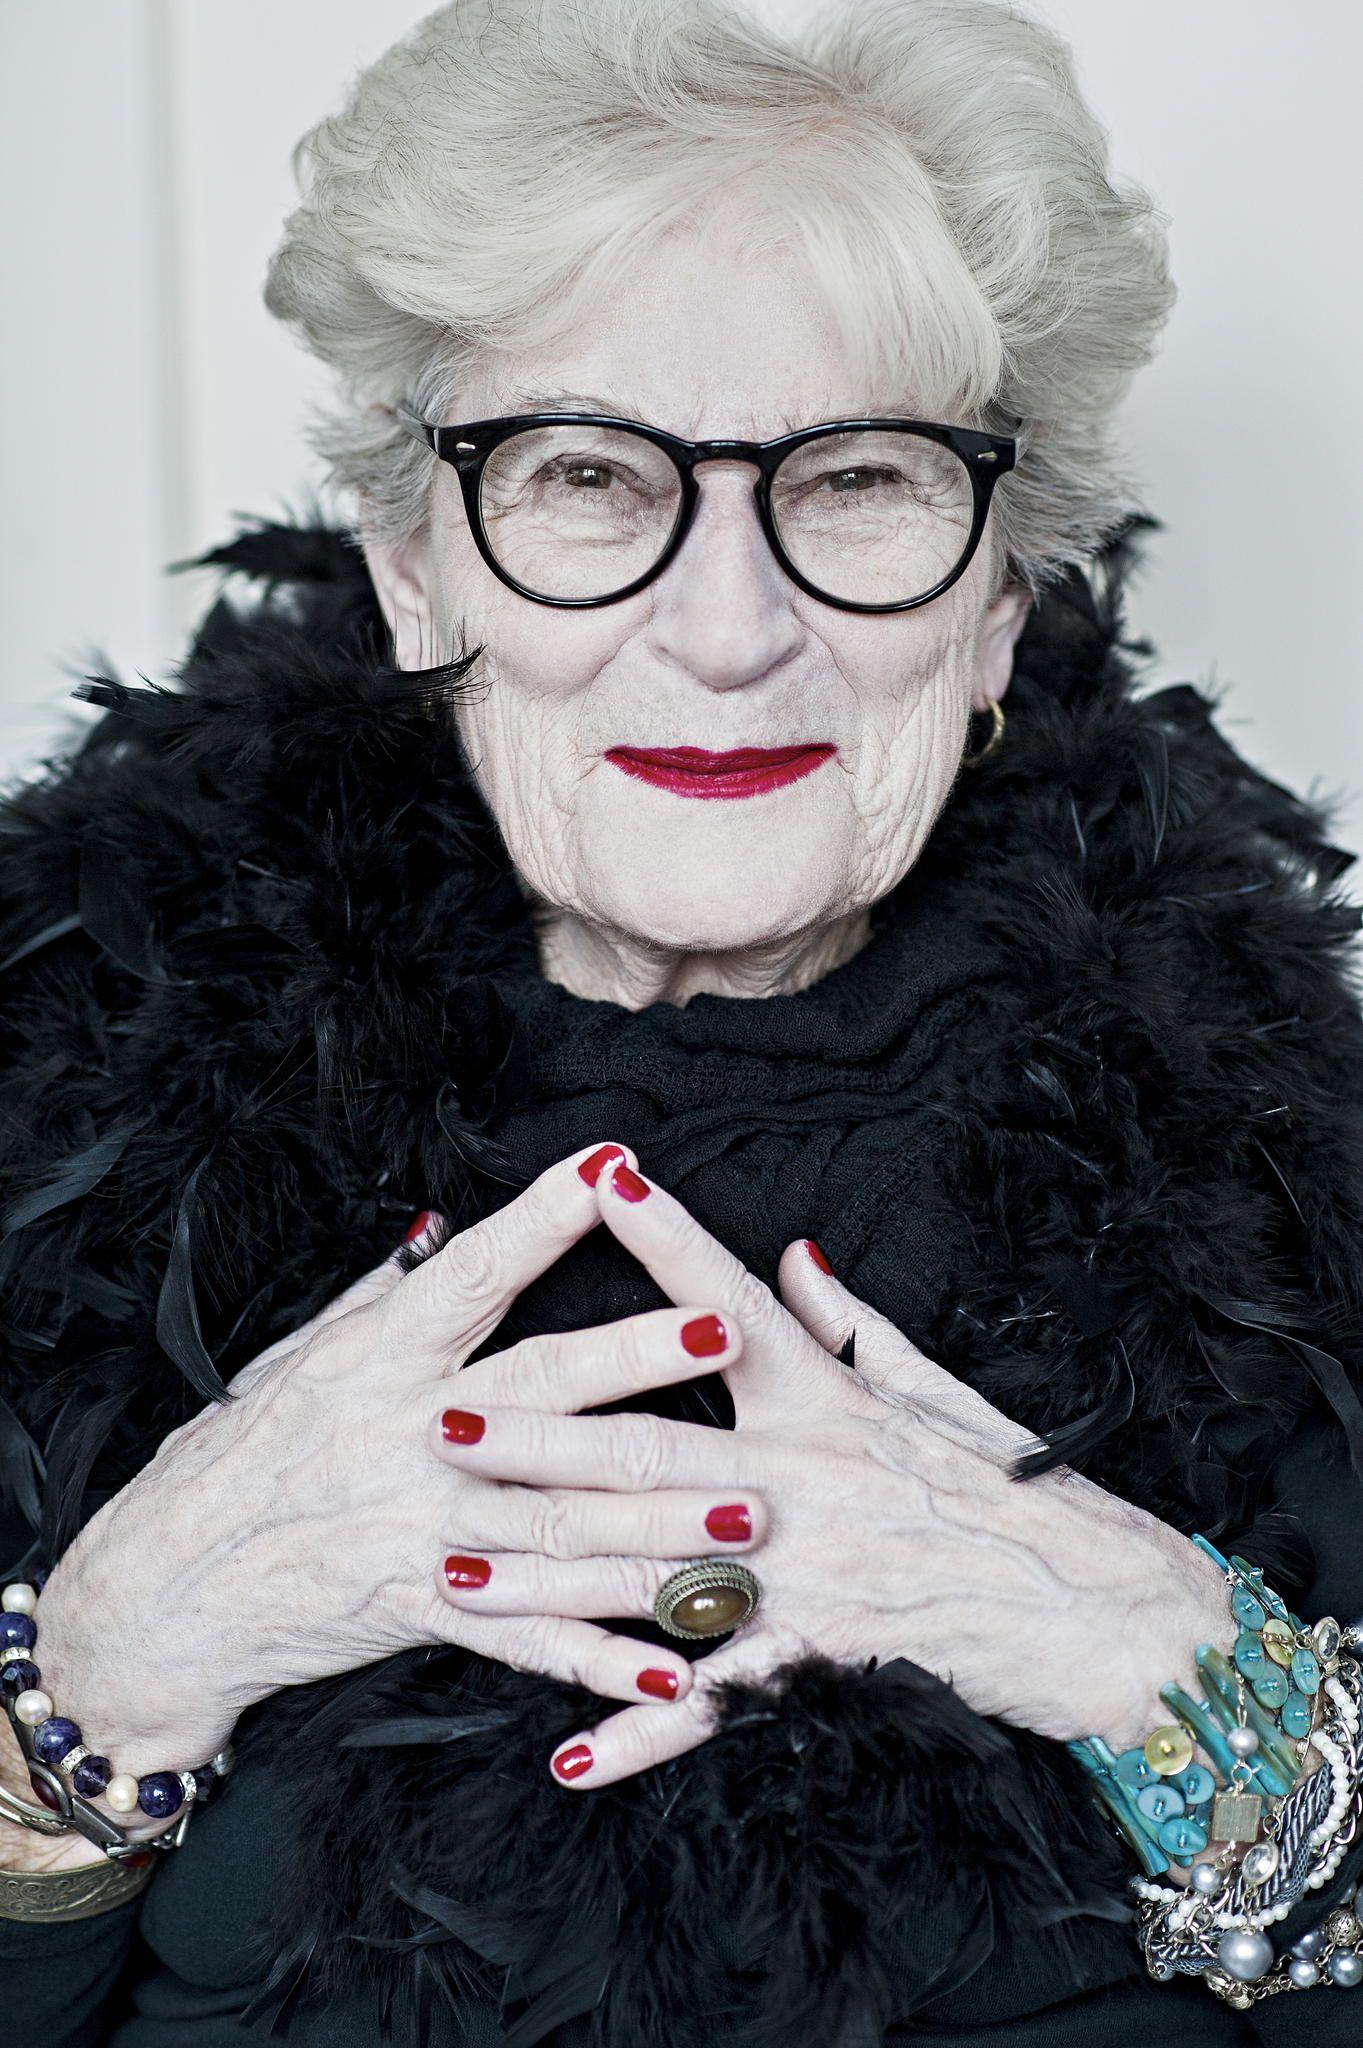 Grandma by Pavel Dufek on 500px